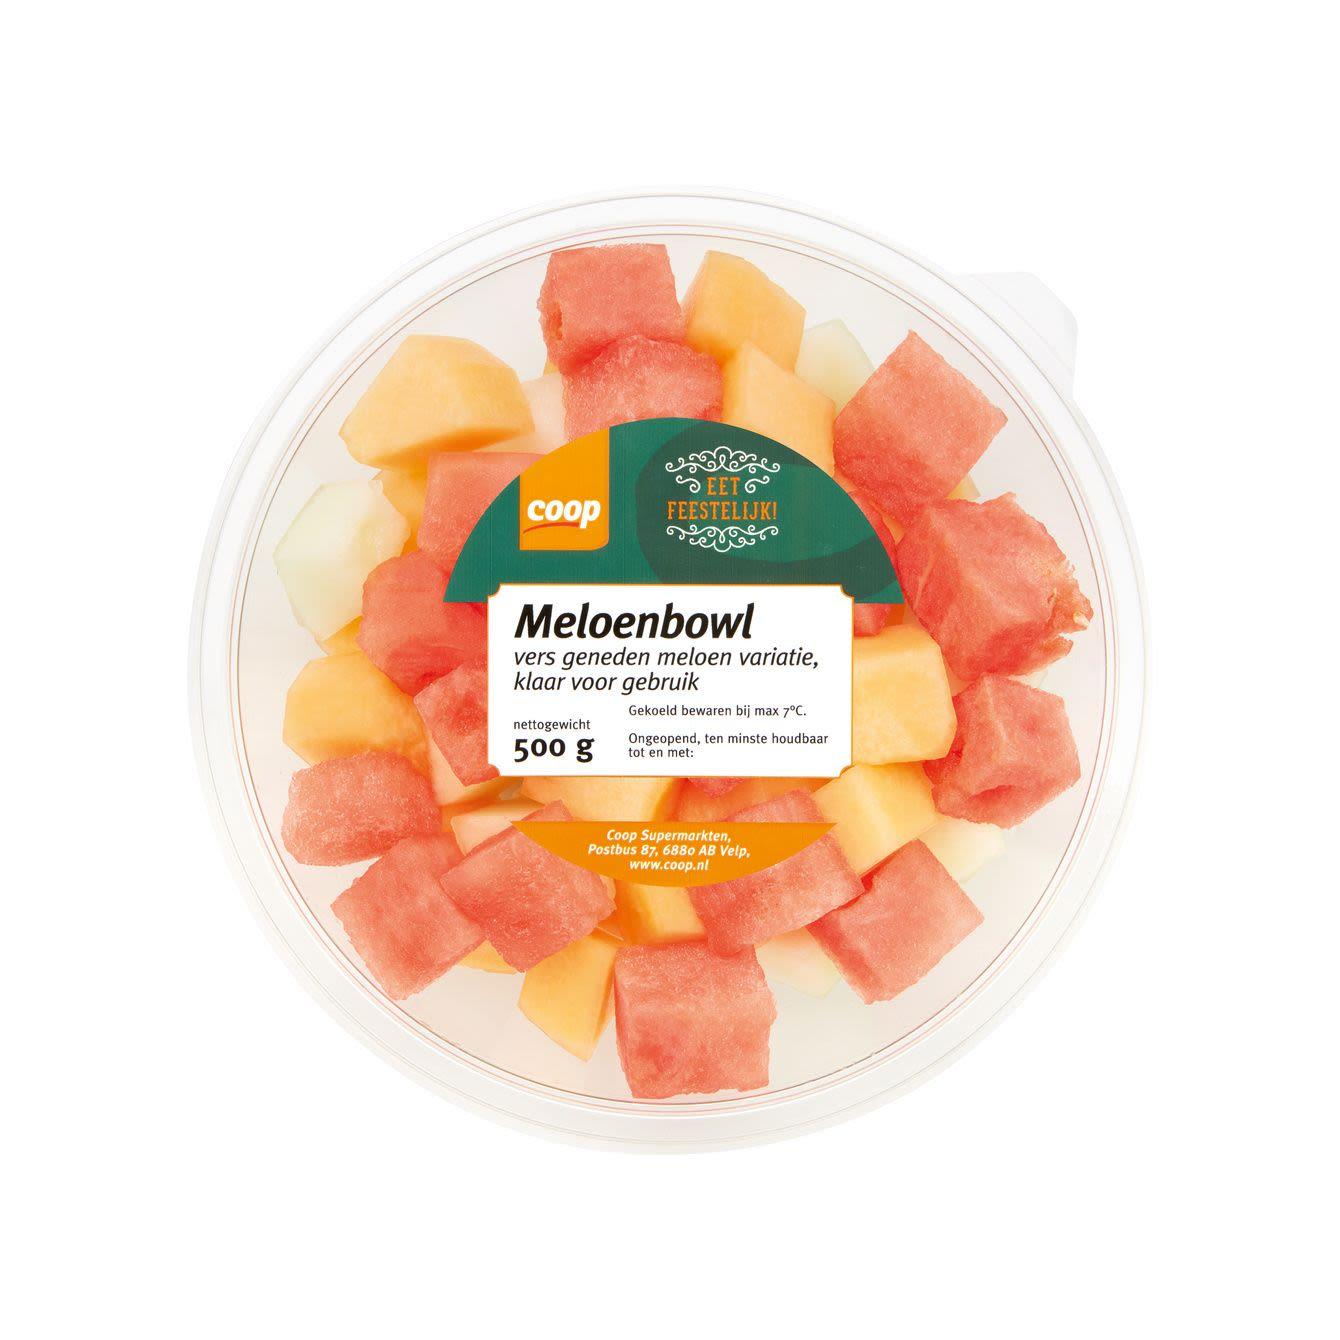 Meloenbowl